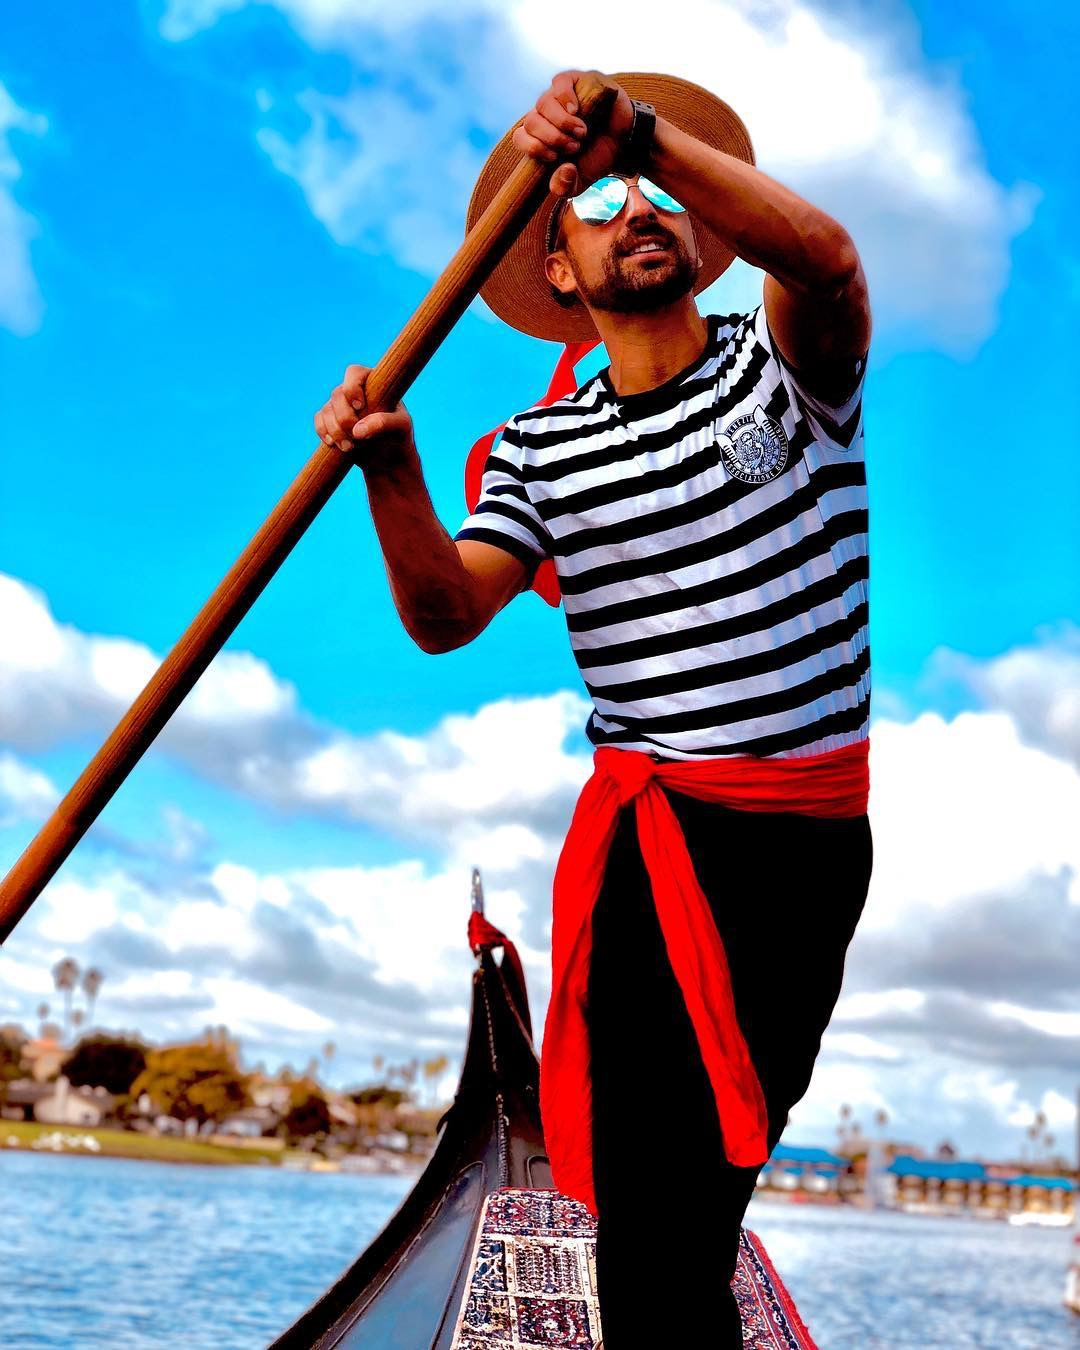 San Diego Date Night Ideas | San Diego Group Events | Black Swan Gondola